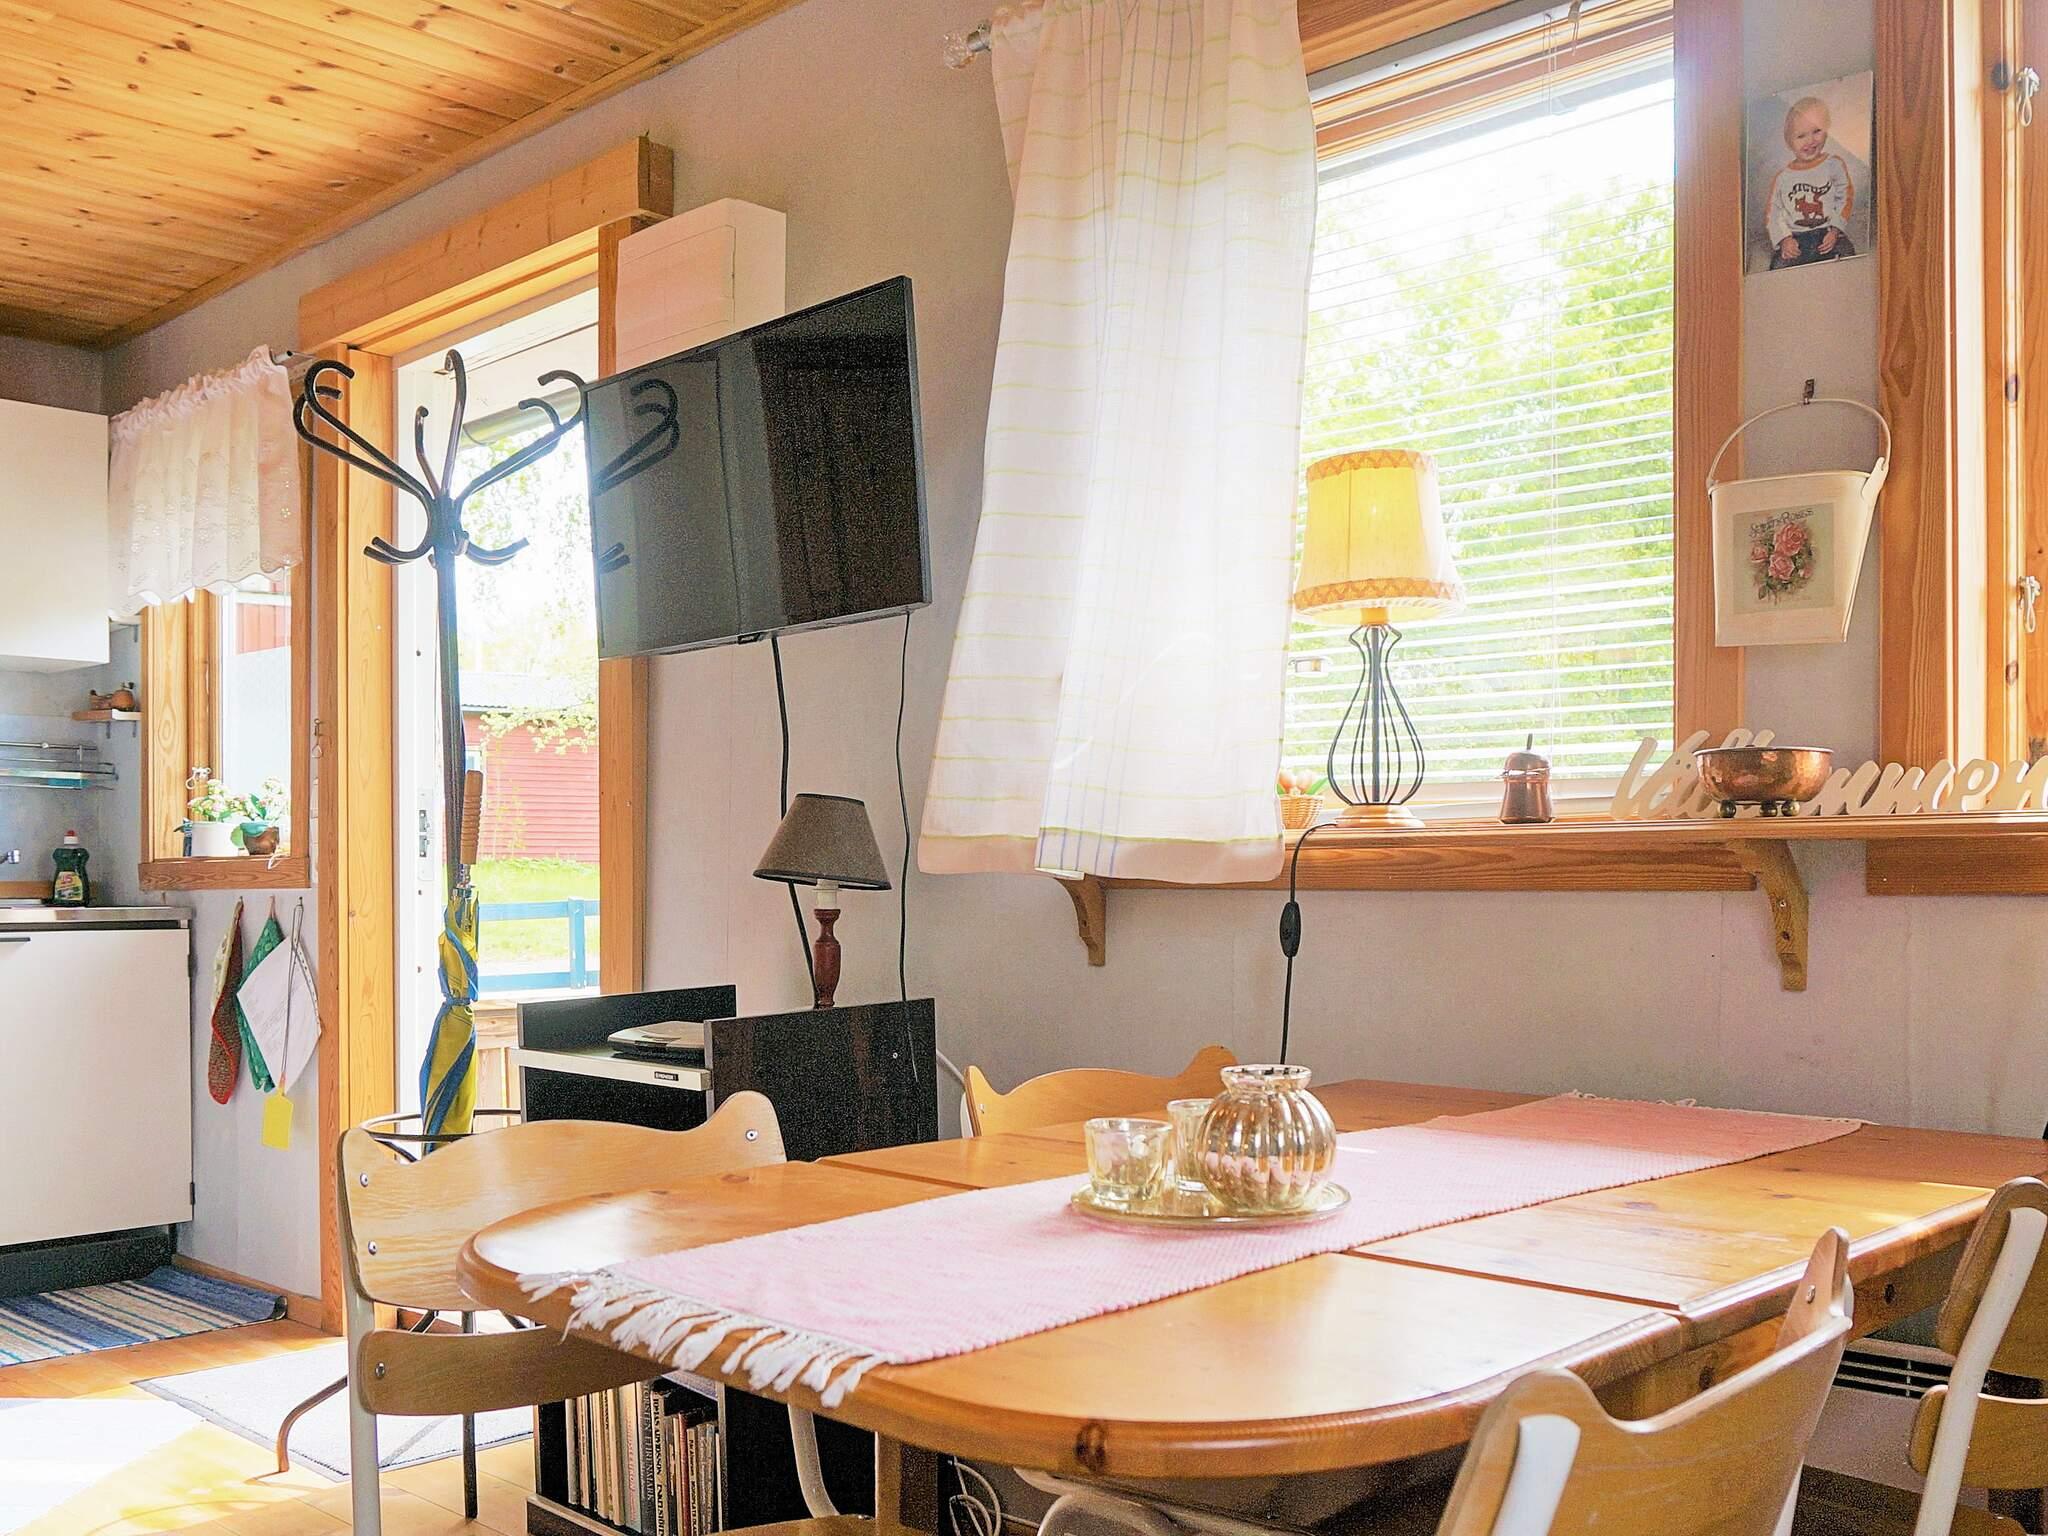 Ferienhaus Töreboda (2627956), Moholm, Västra Götaland län, Westschweden, Schweden, Bild 3